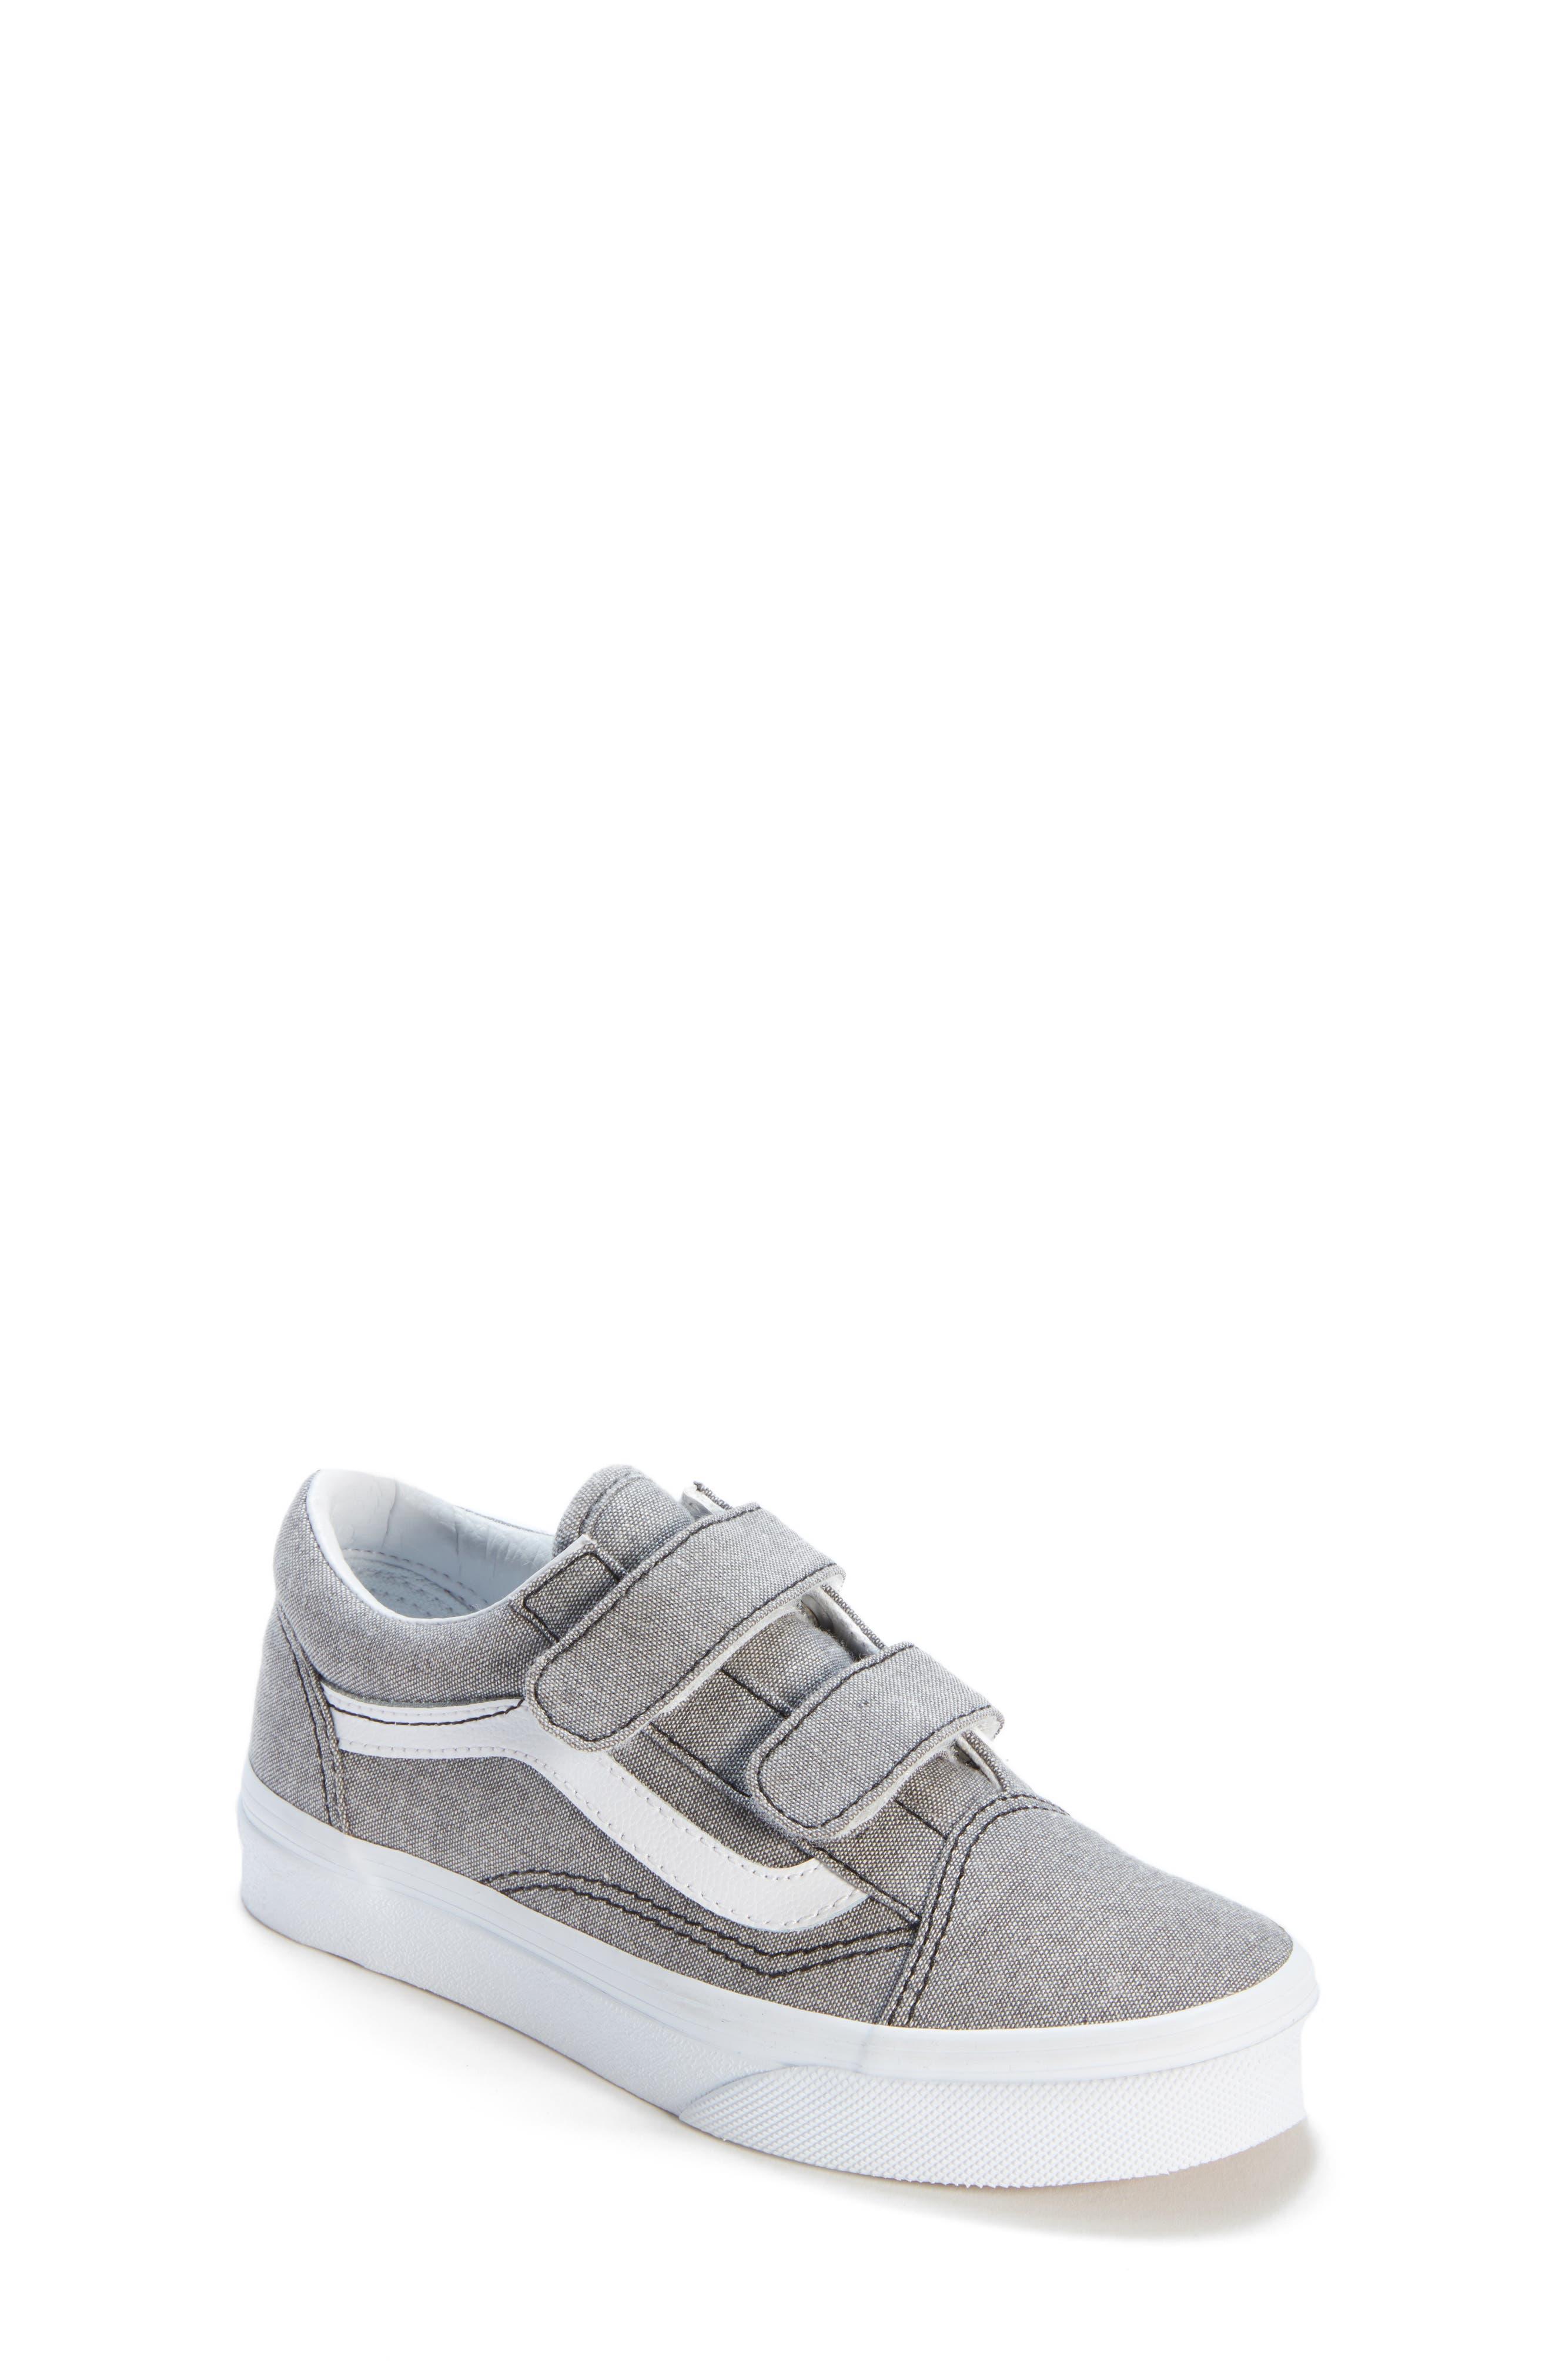 'Old Skool' Sneaker,                         Main,                         color, OXFORD GRAY TRUE WHITE